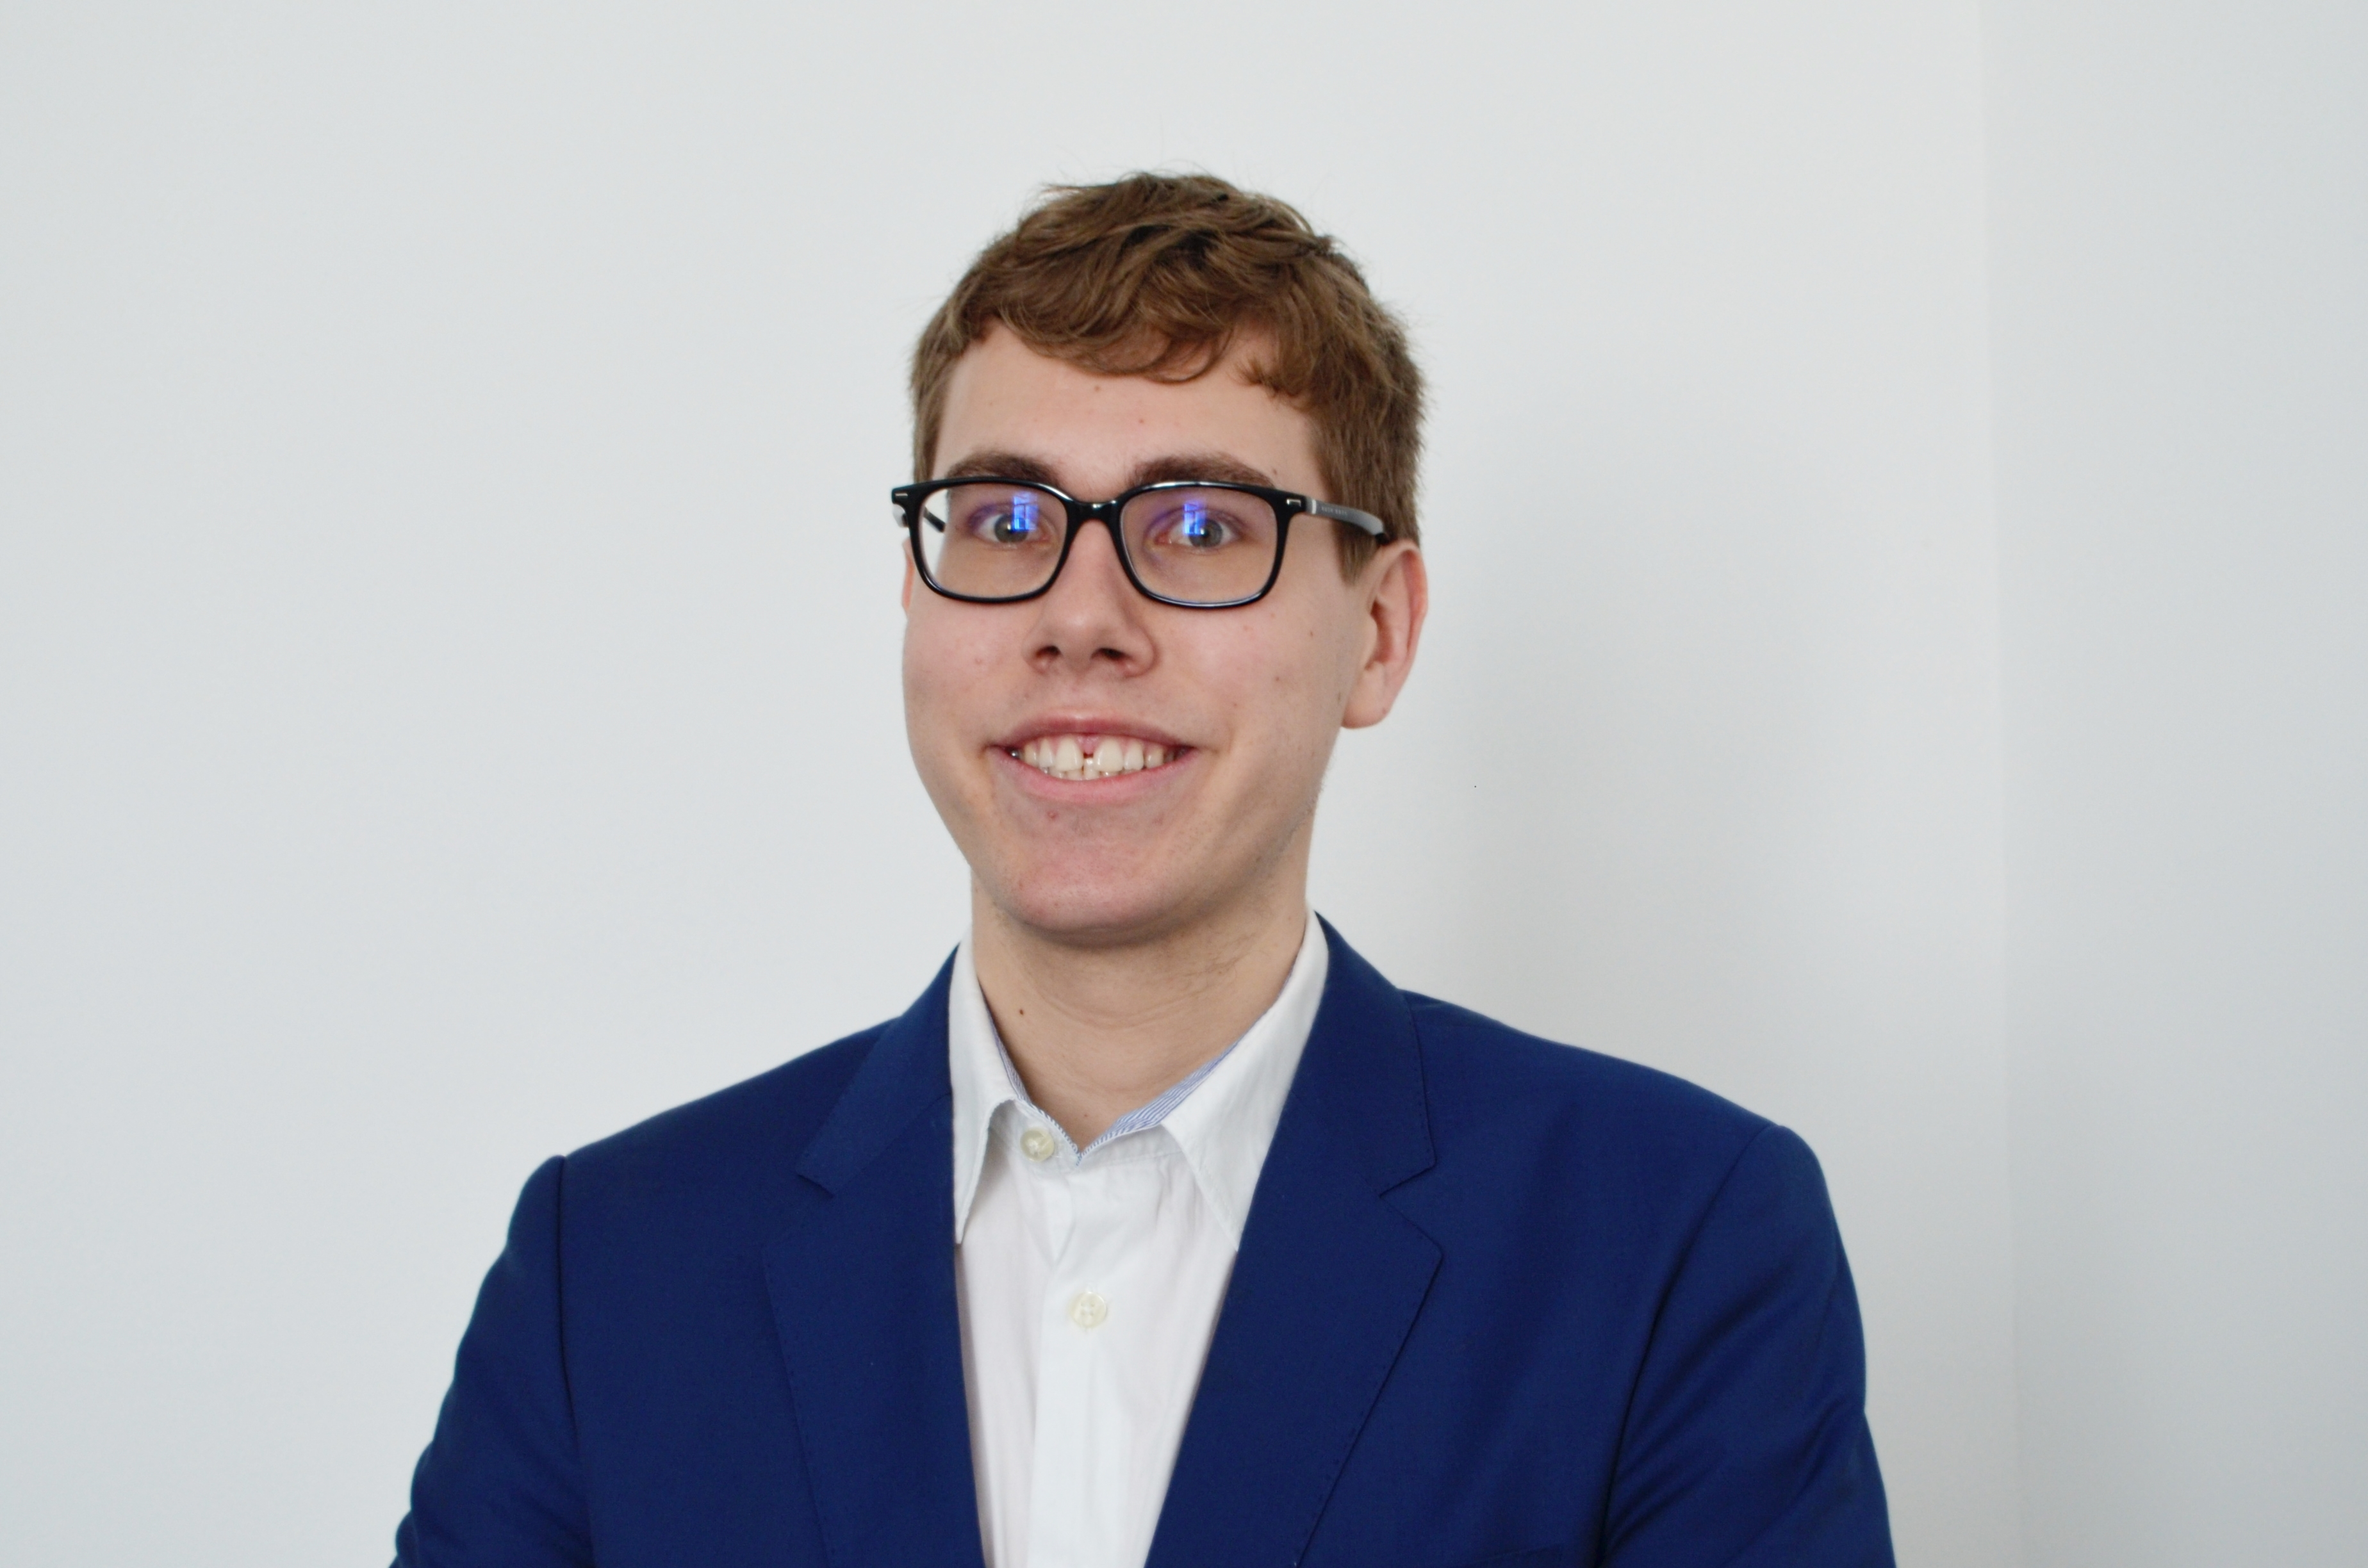 Clemens Pusch, LL.B. (WU)